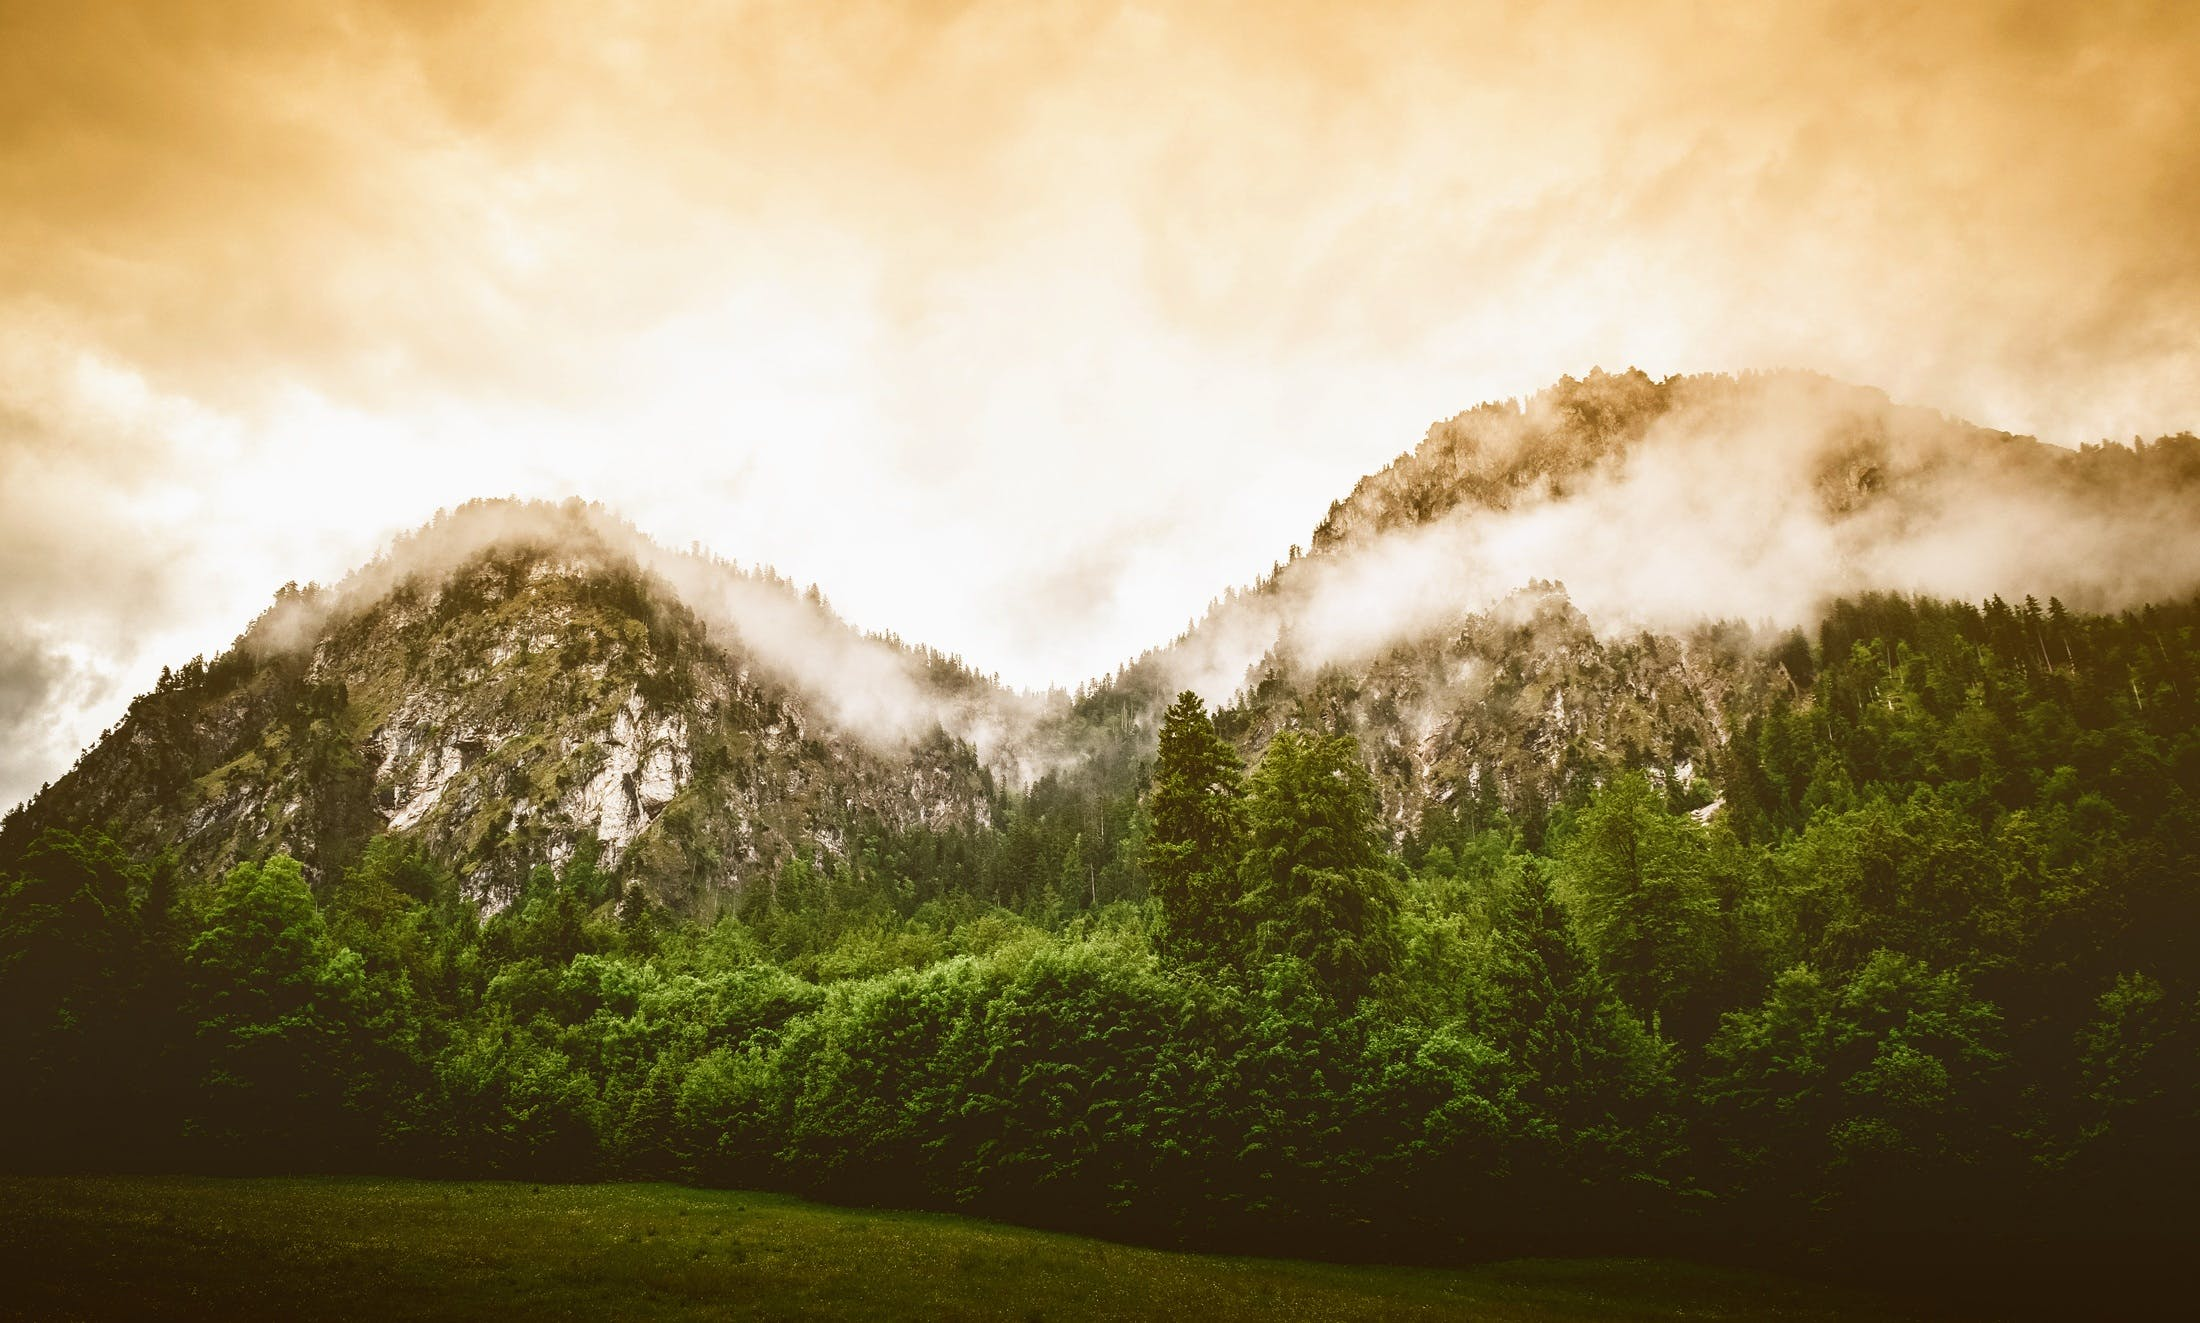 Kostenloses Stock Foto zu abend, baum, bäume, berg